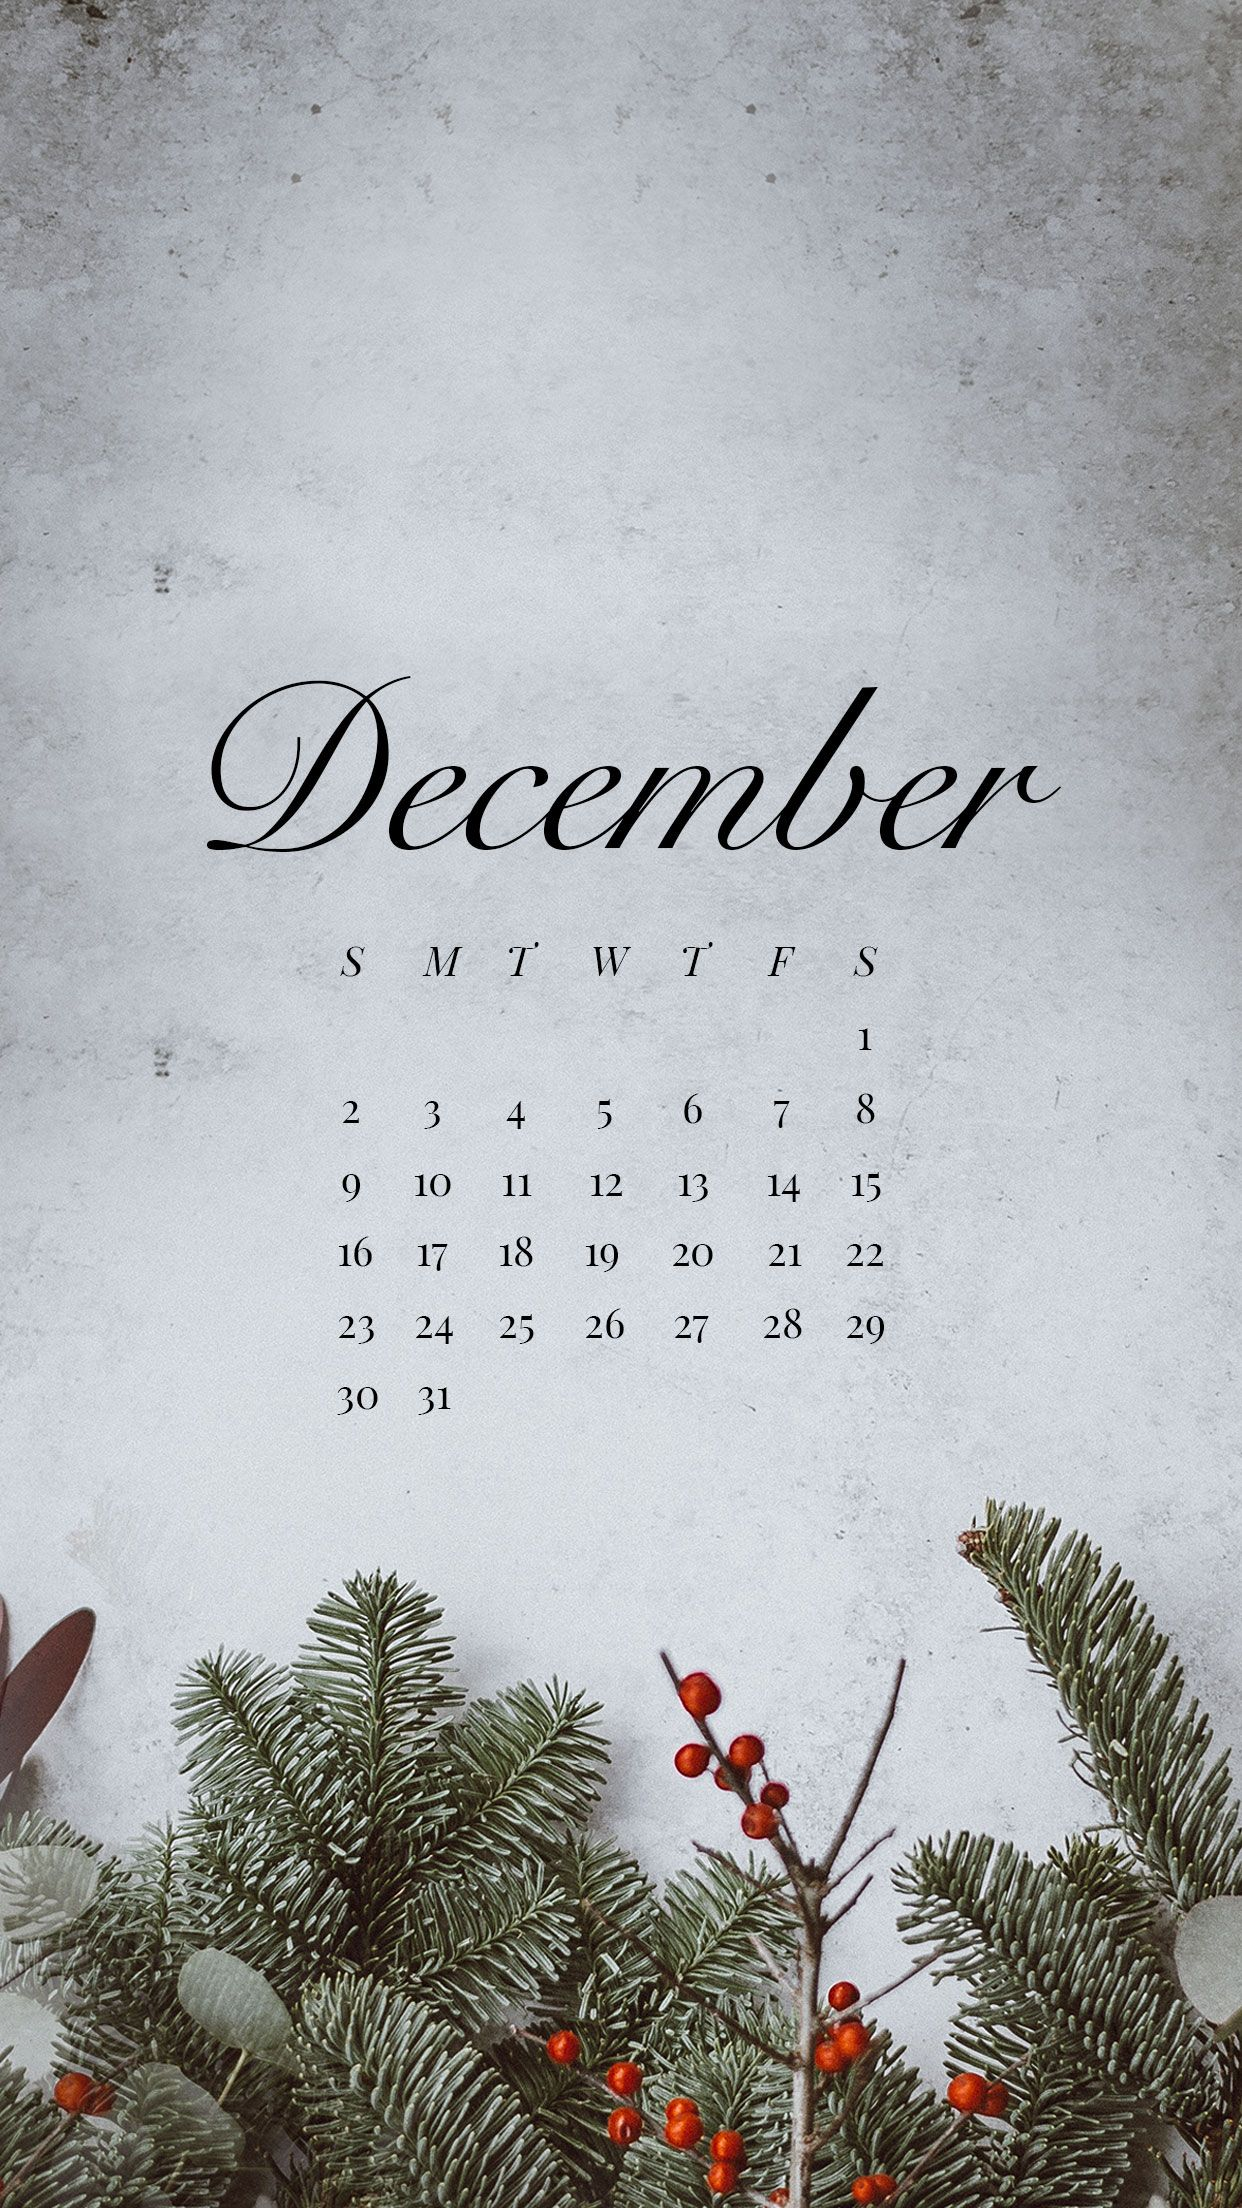 December Desktop and Mobile Wallpaper